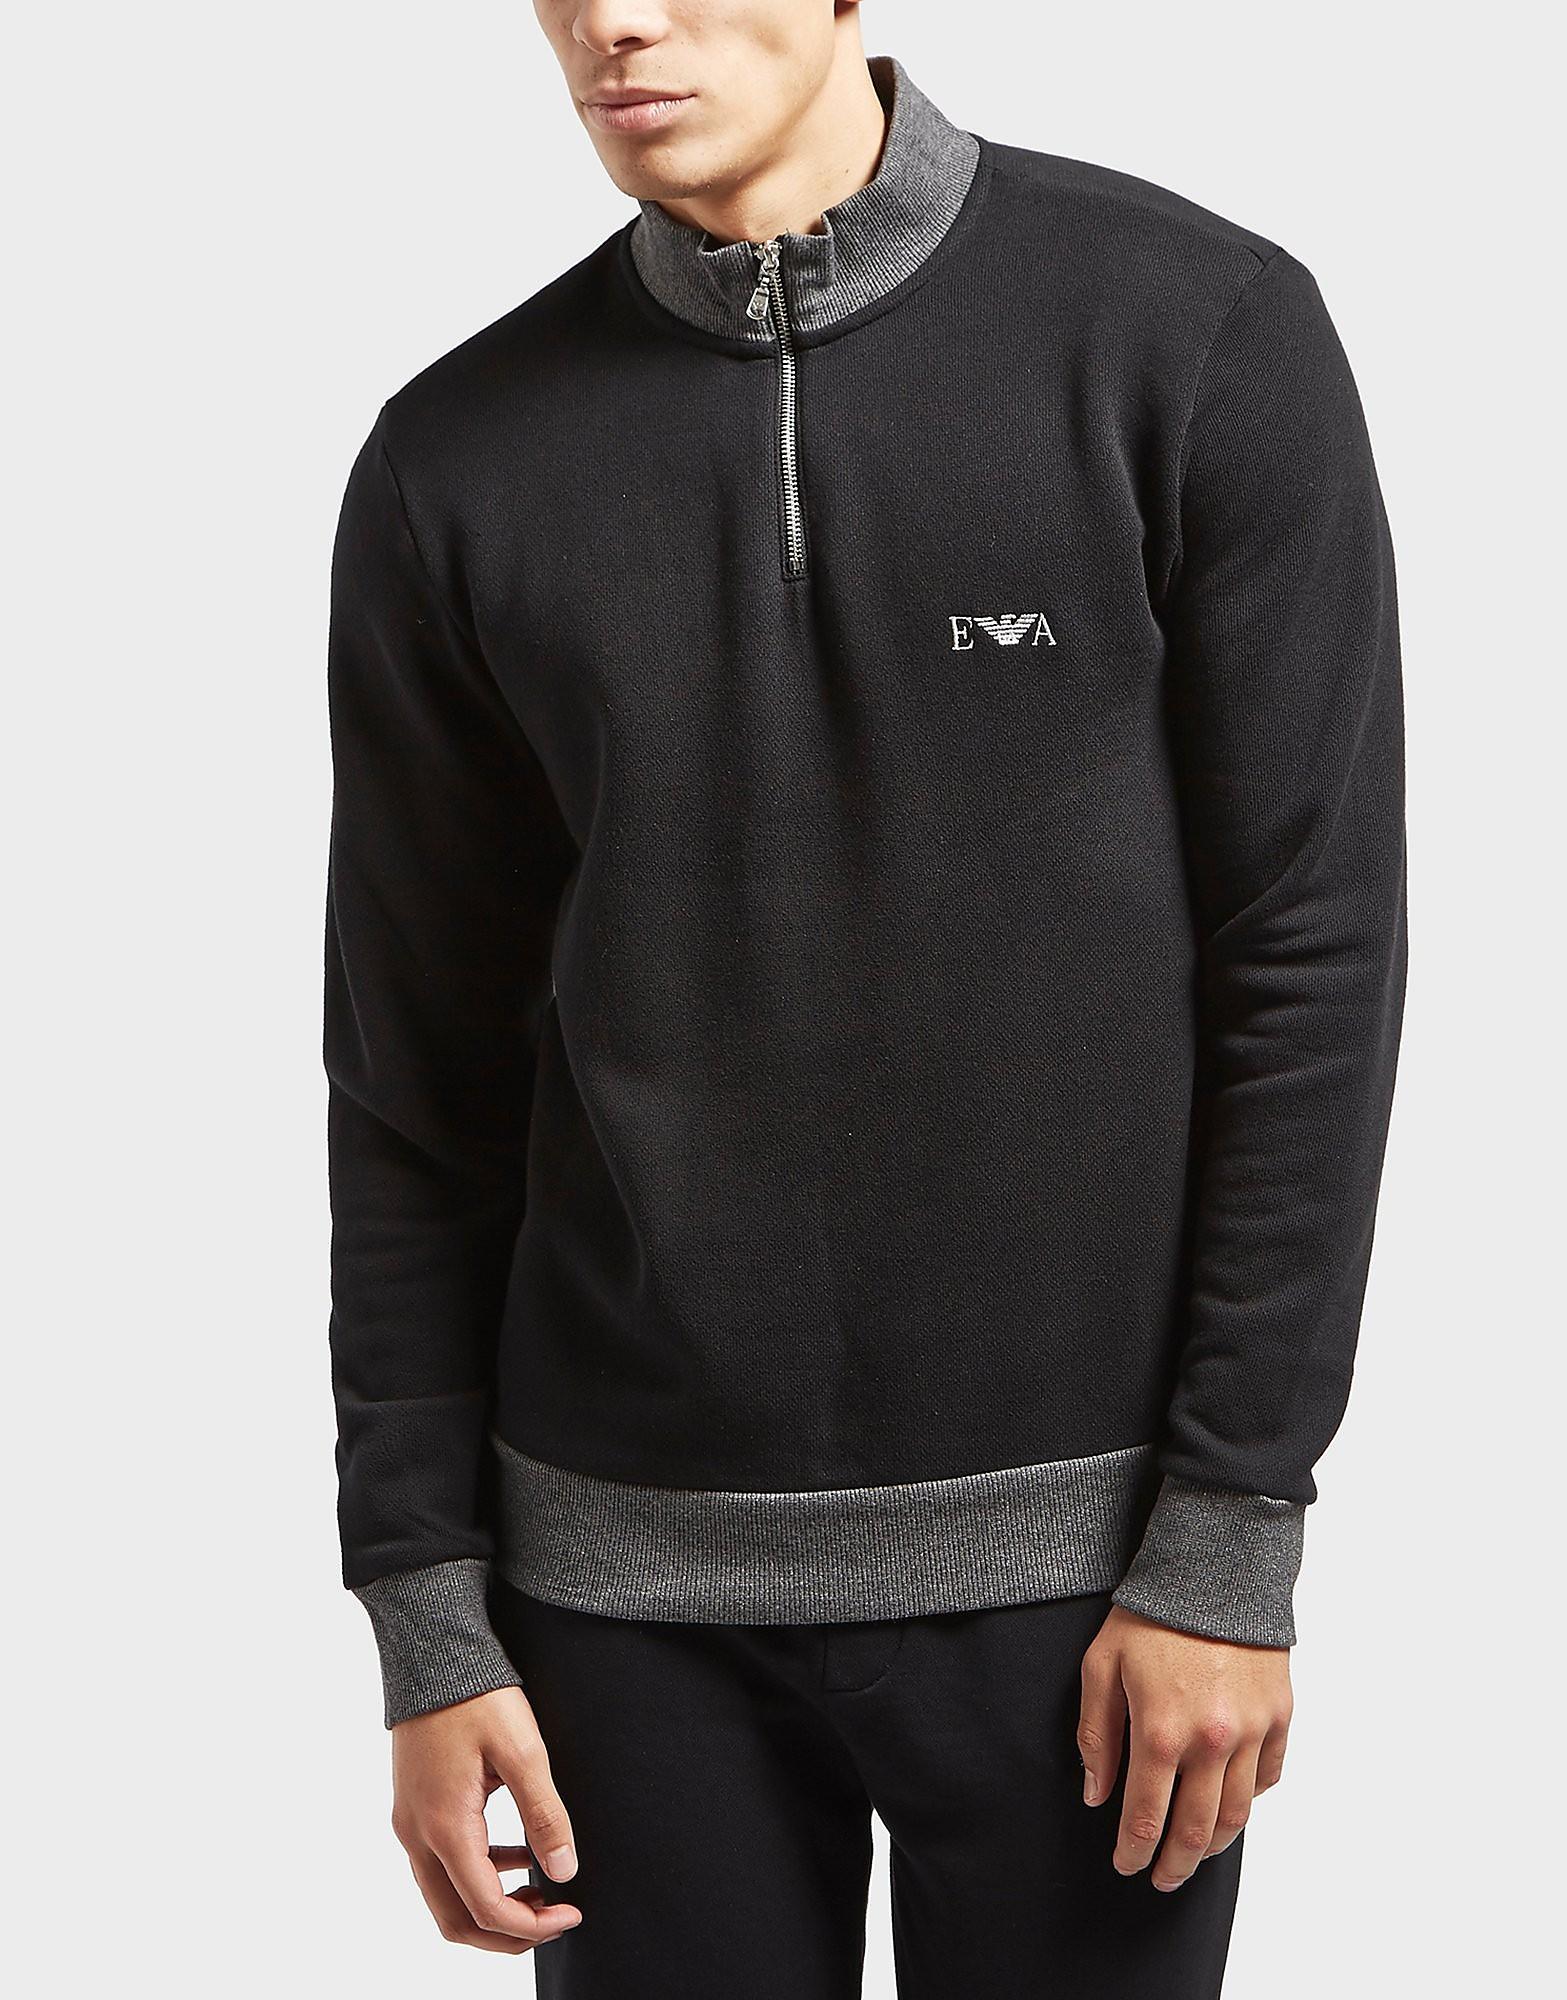 Emporio Armani Terry Quarter Zip Sweatshirt